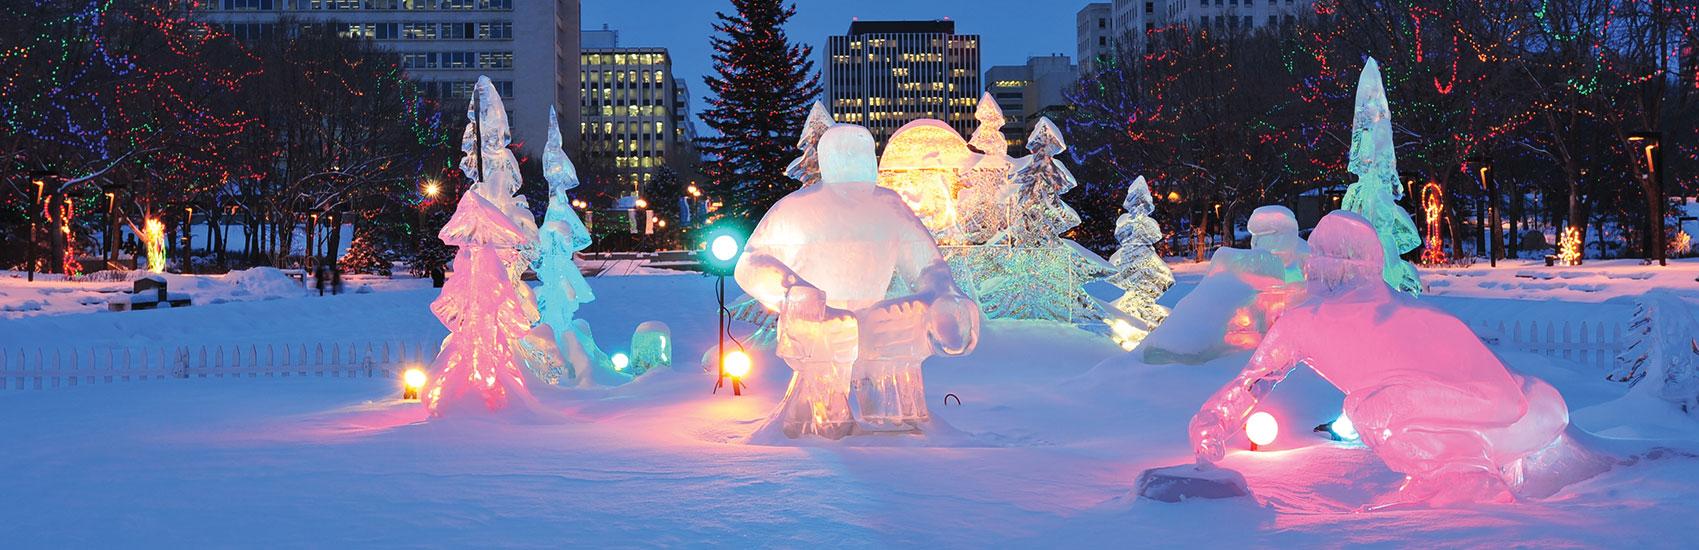 See Canada - Edmonton 4